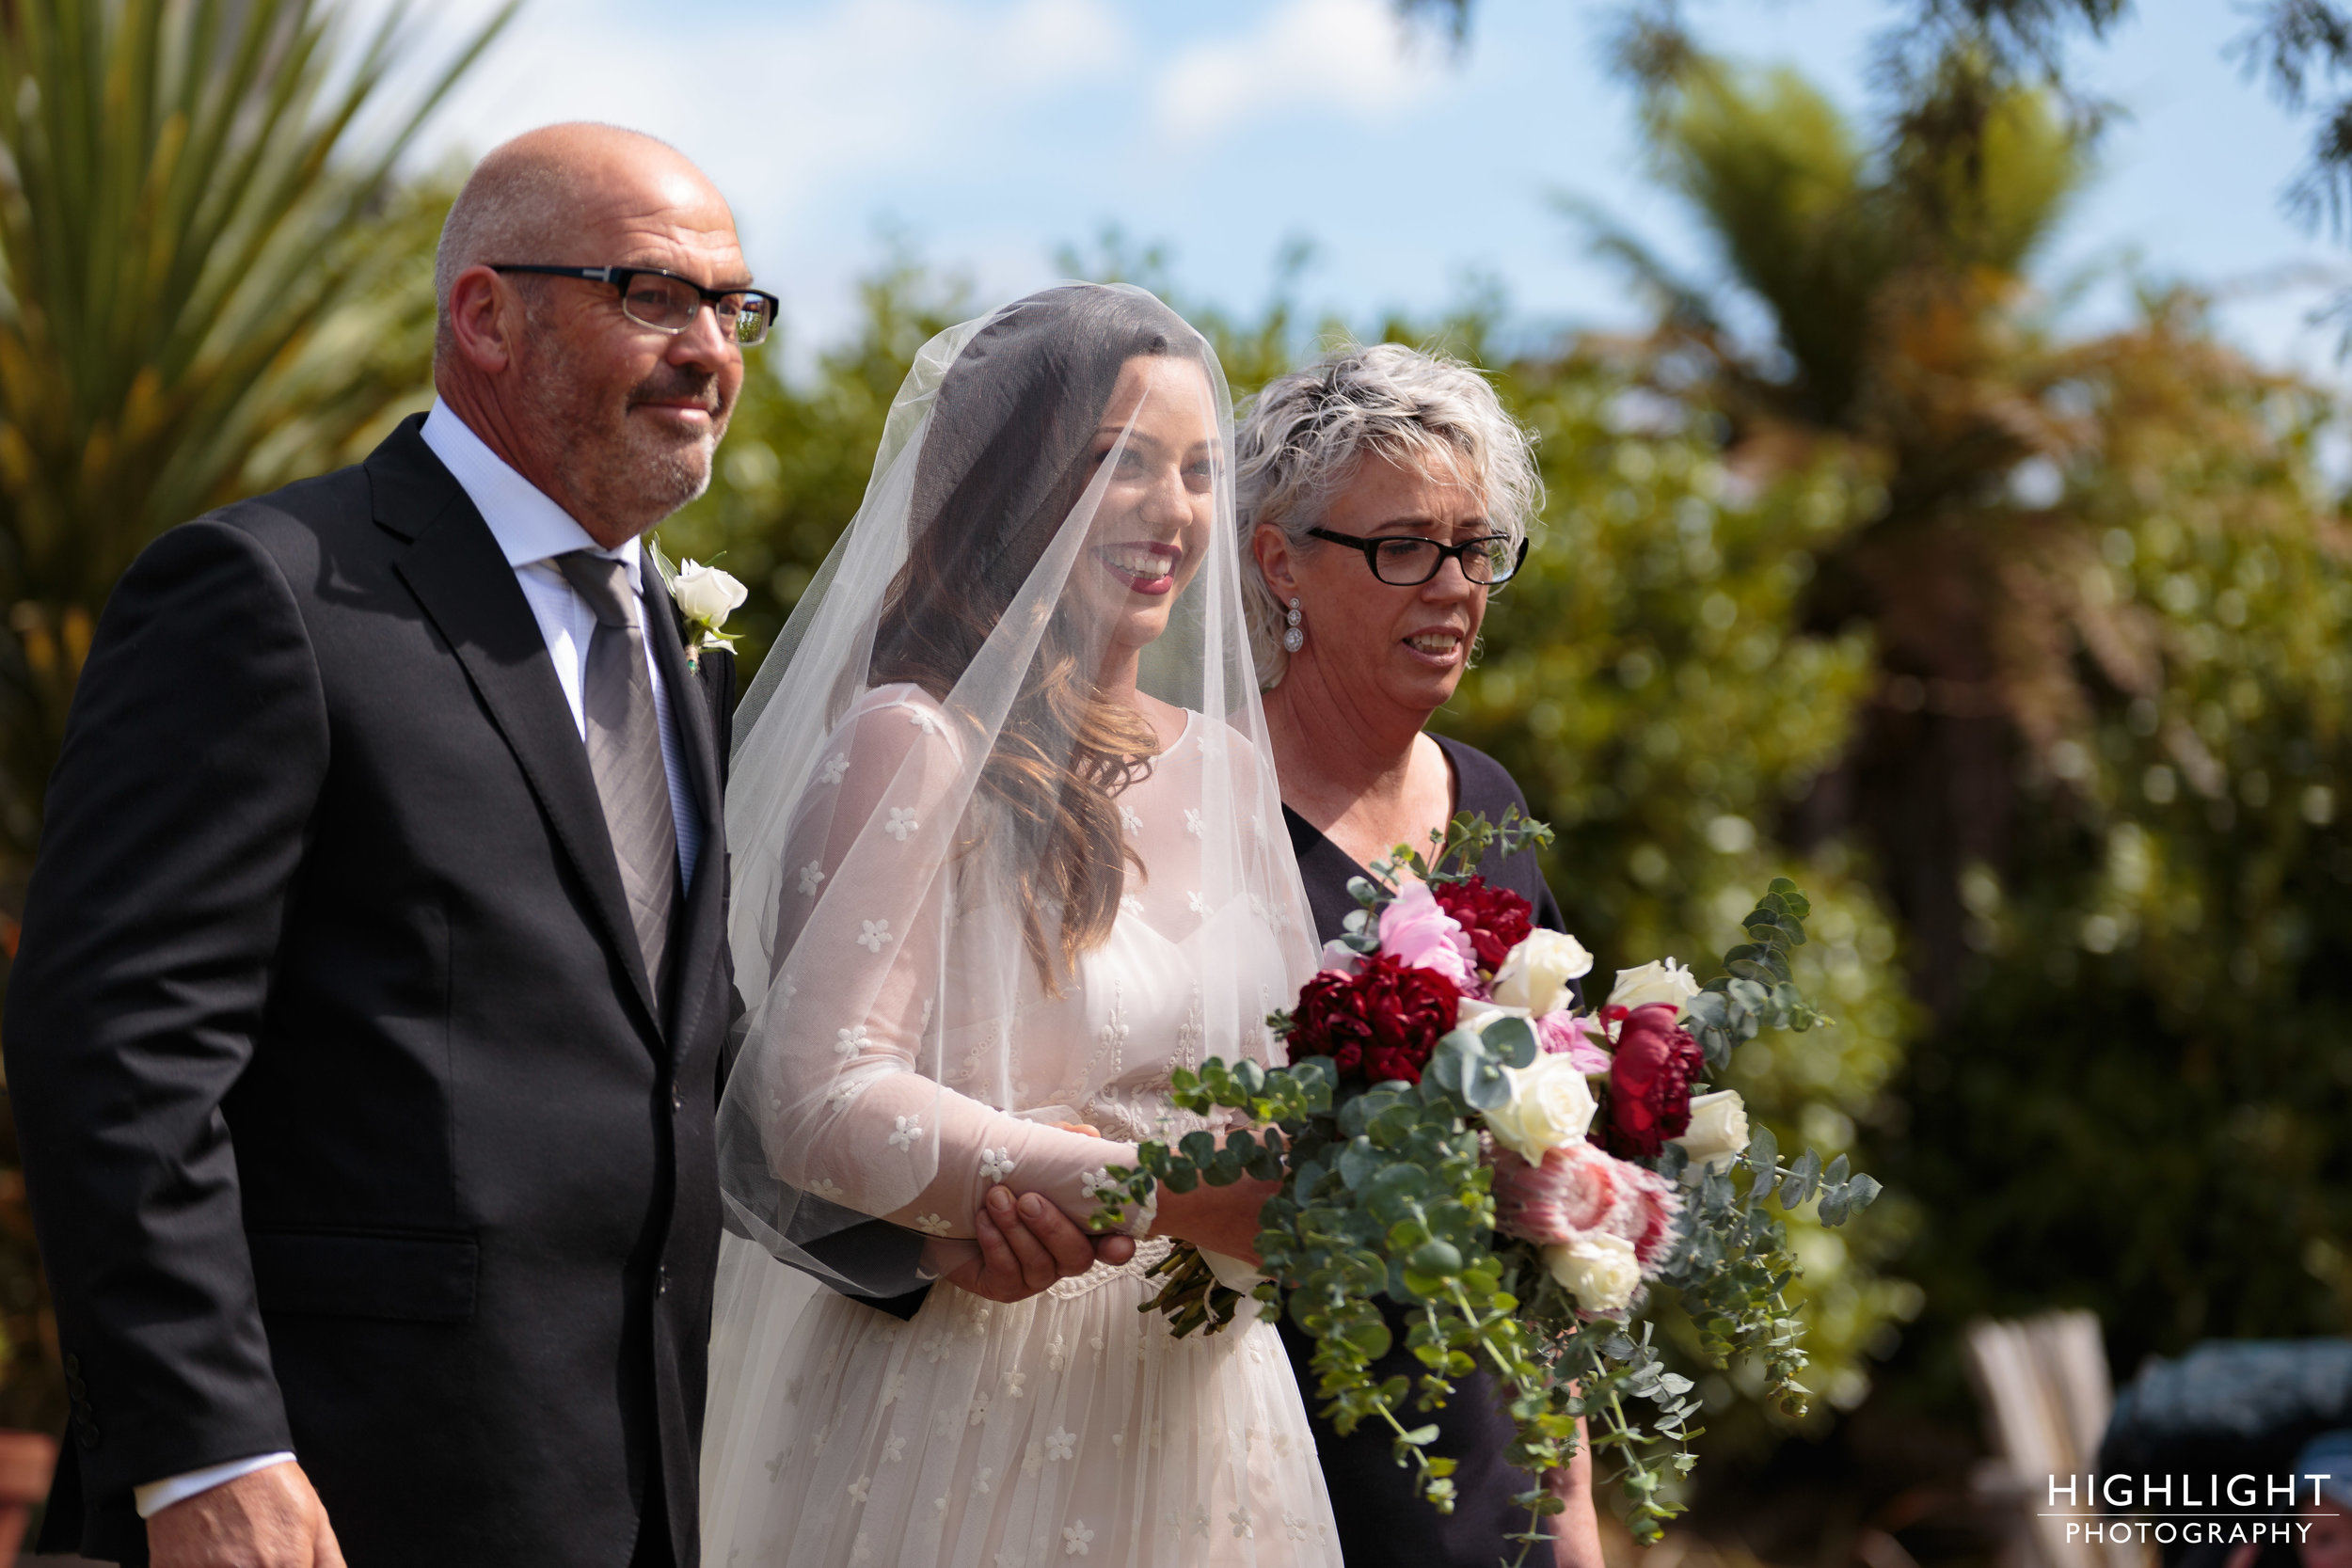 highlight-wedding-photography-new-zealand-makoura-lodge-wedding-57.jpg